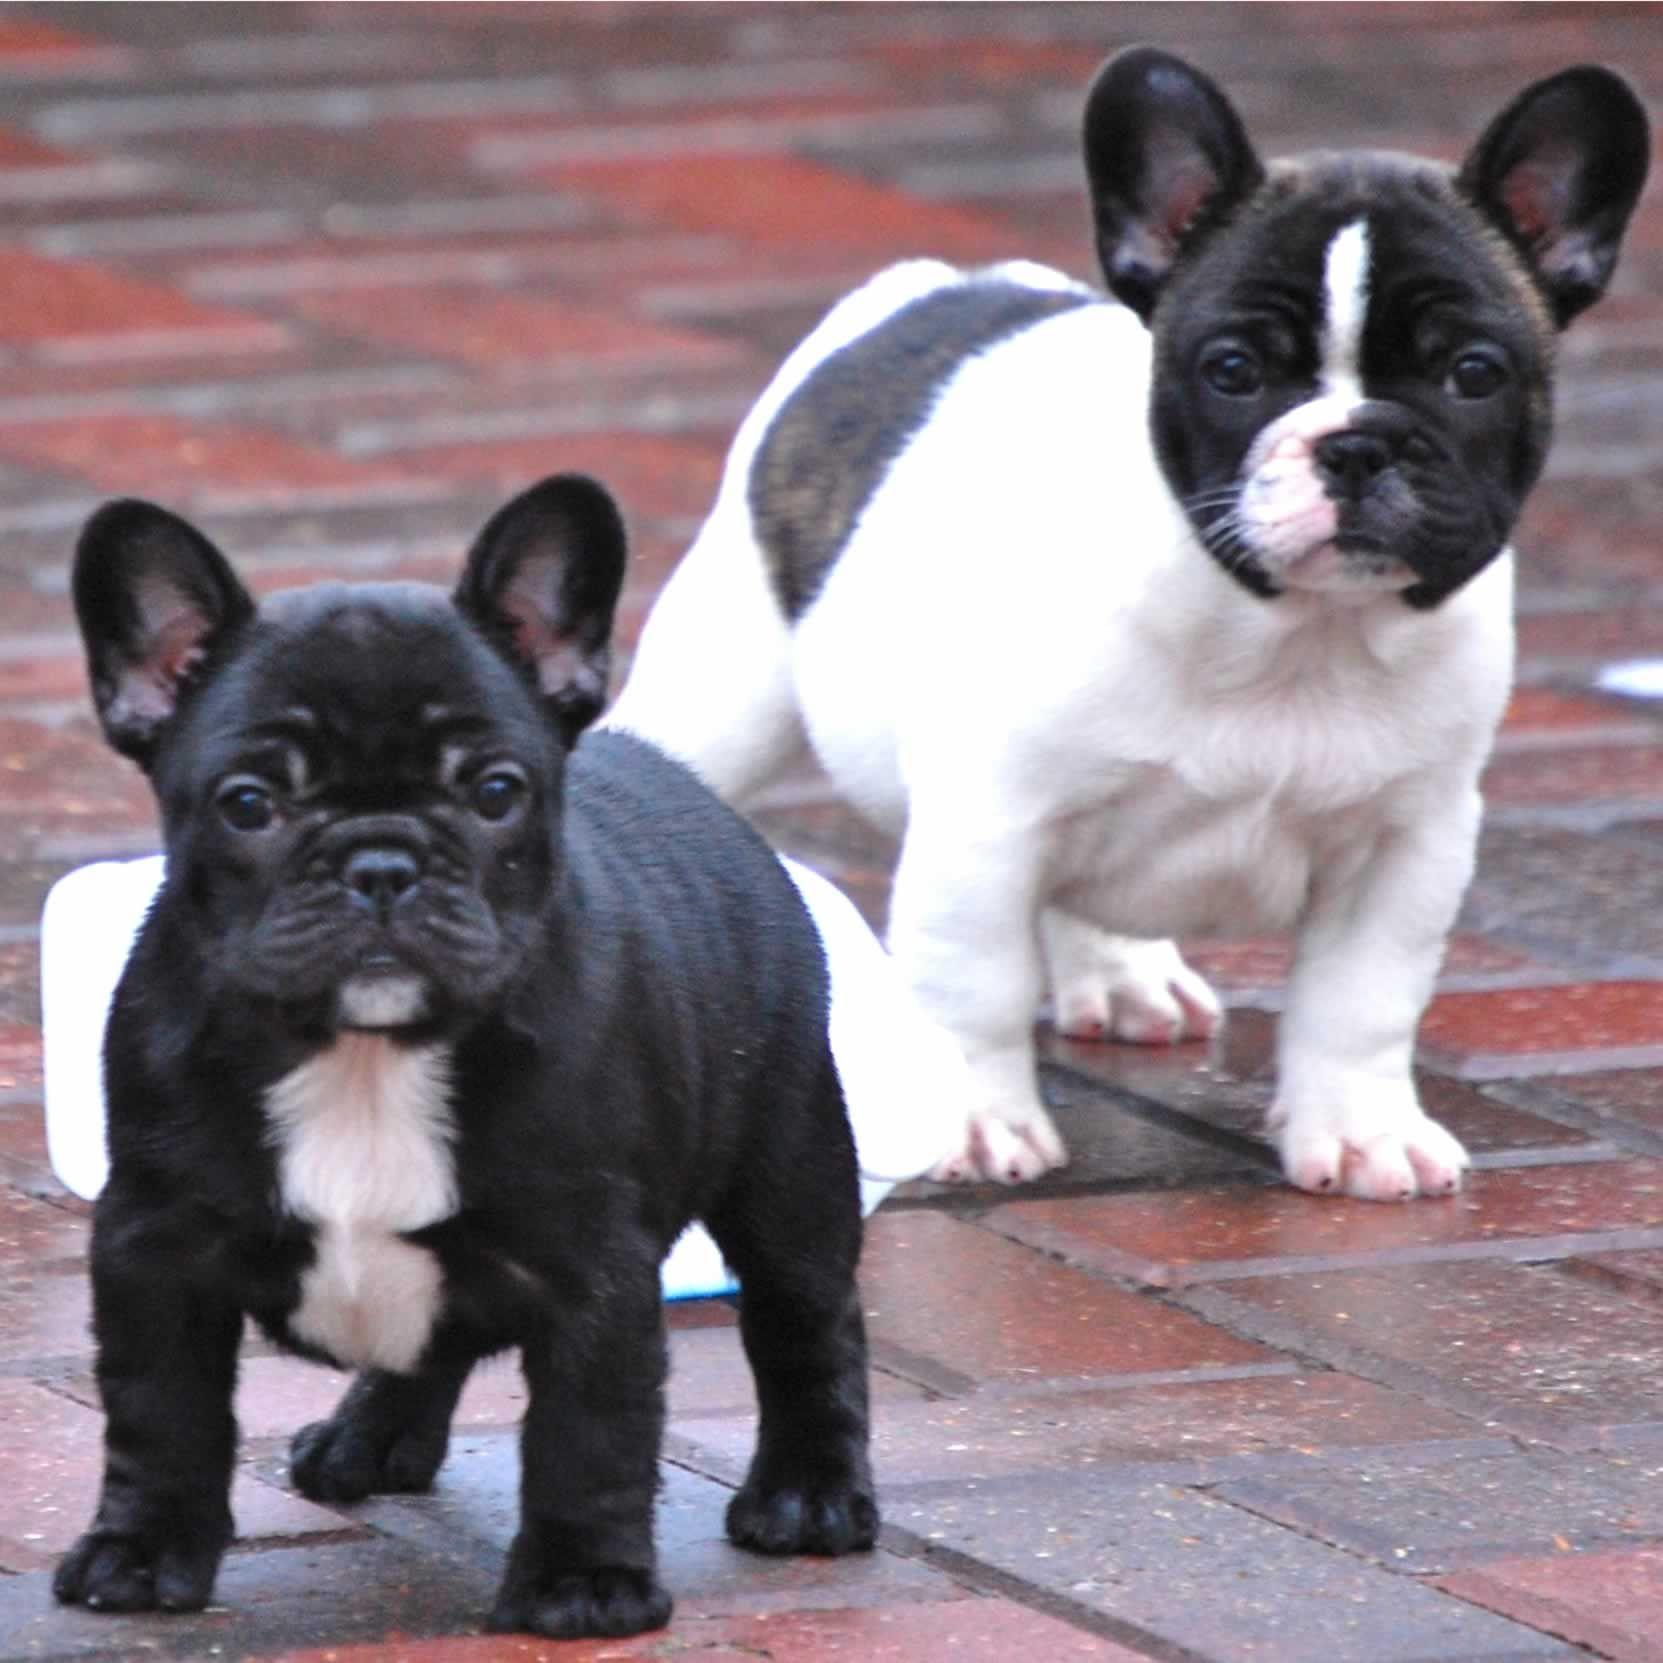 frenchies | bulldog puppies, french bulldog puppies, baby